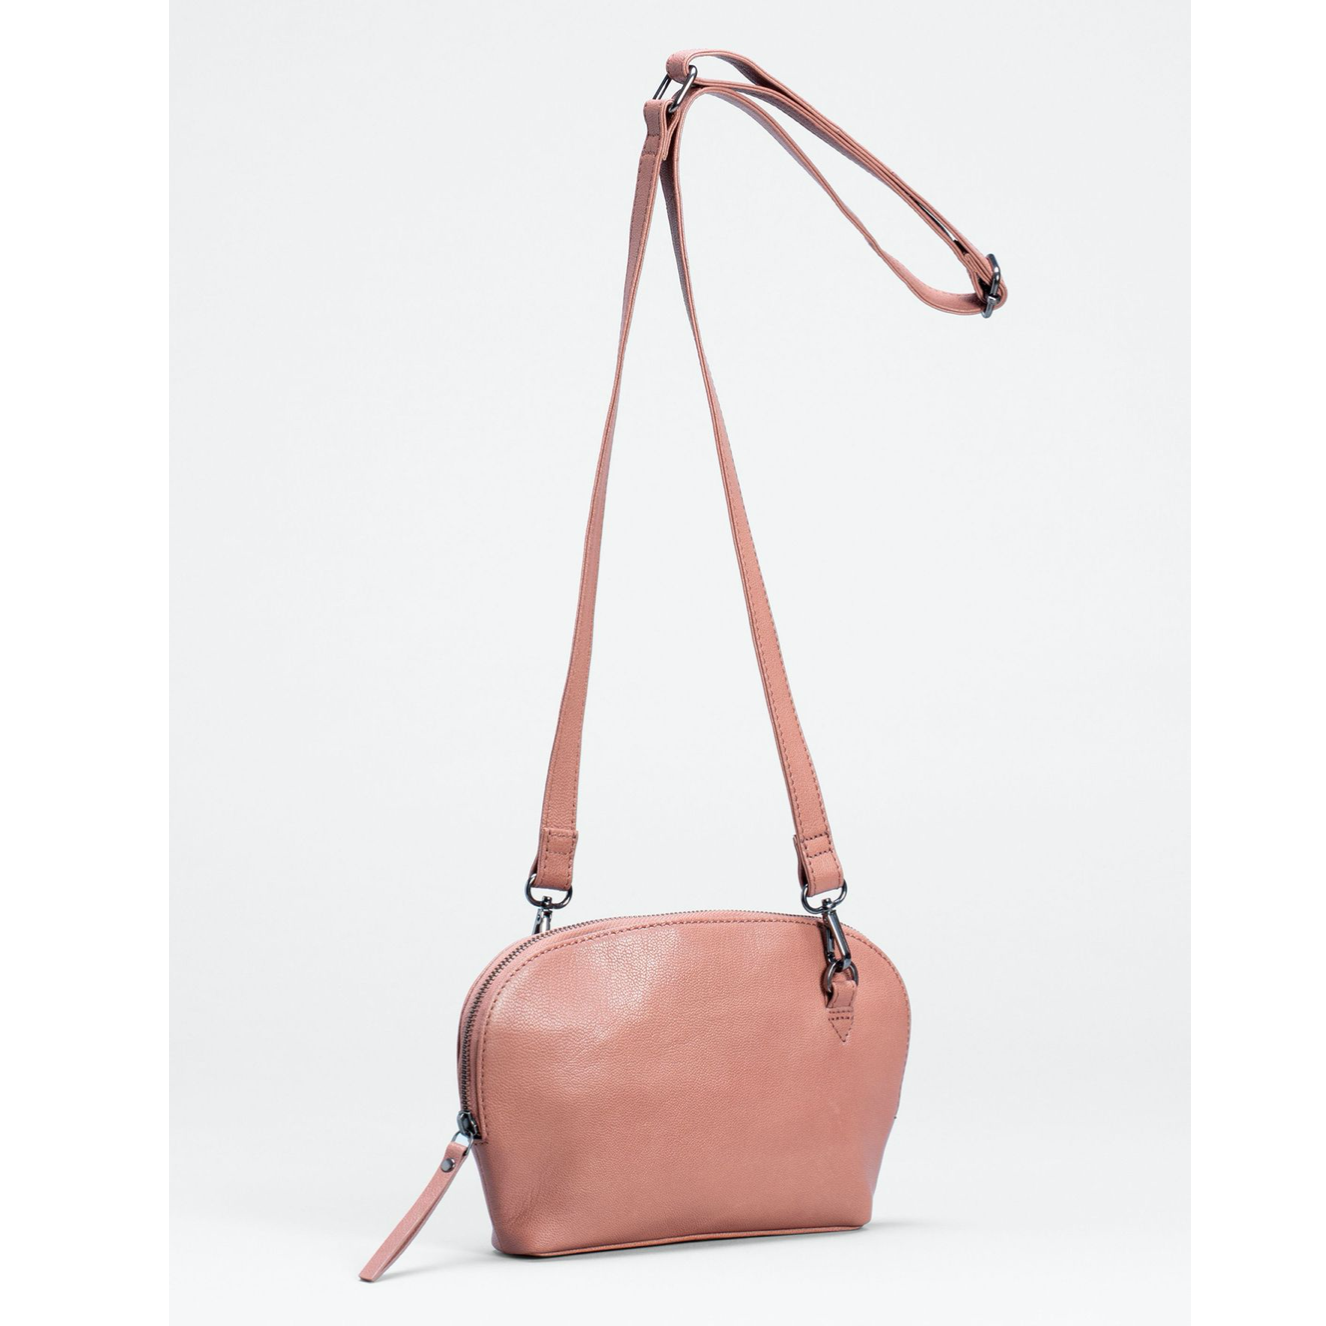 Lotte Small Bag - Cognac